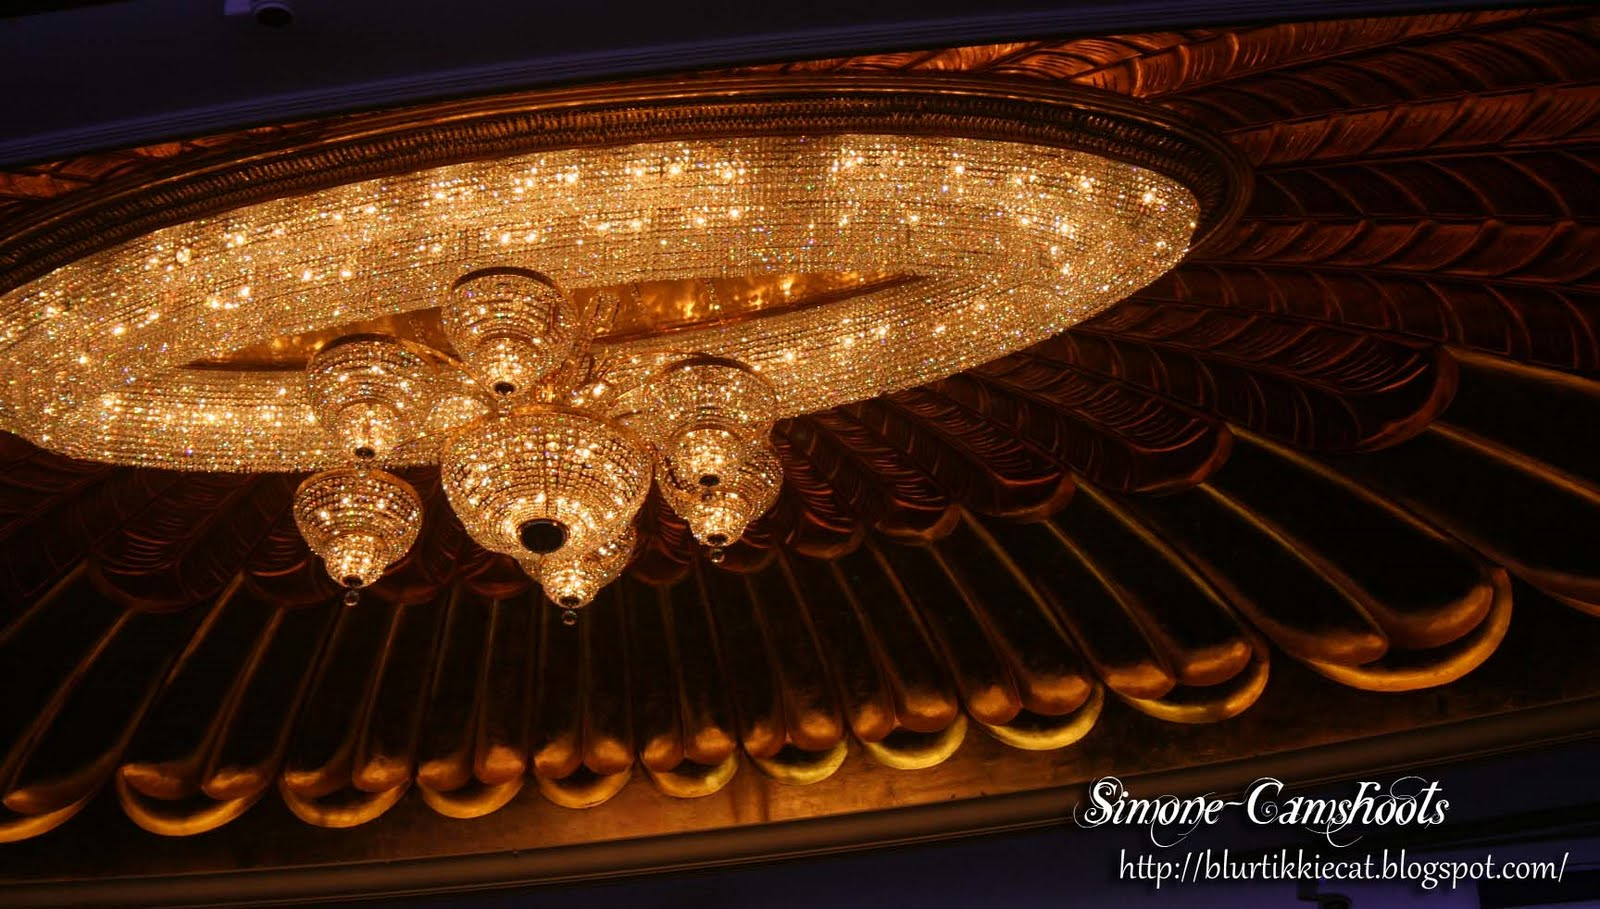 The chandelier ballroom chandelier online chandelier ballroom club facebook arubaitofo Gallery